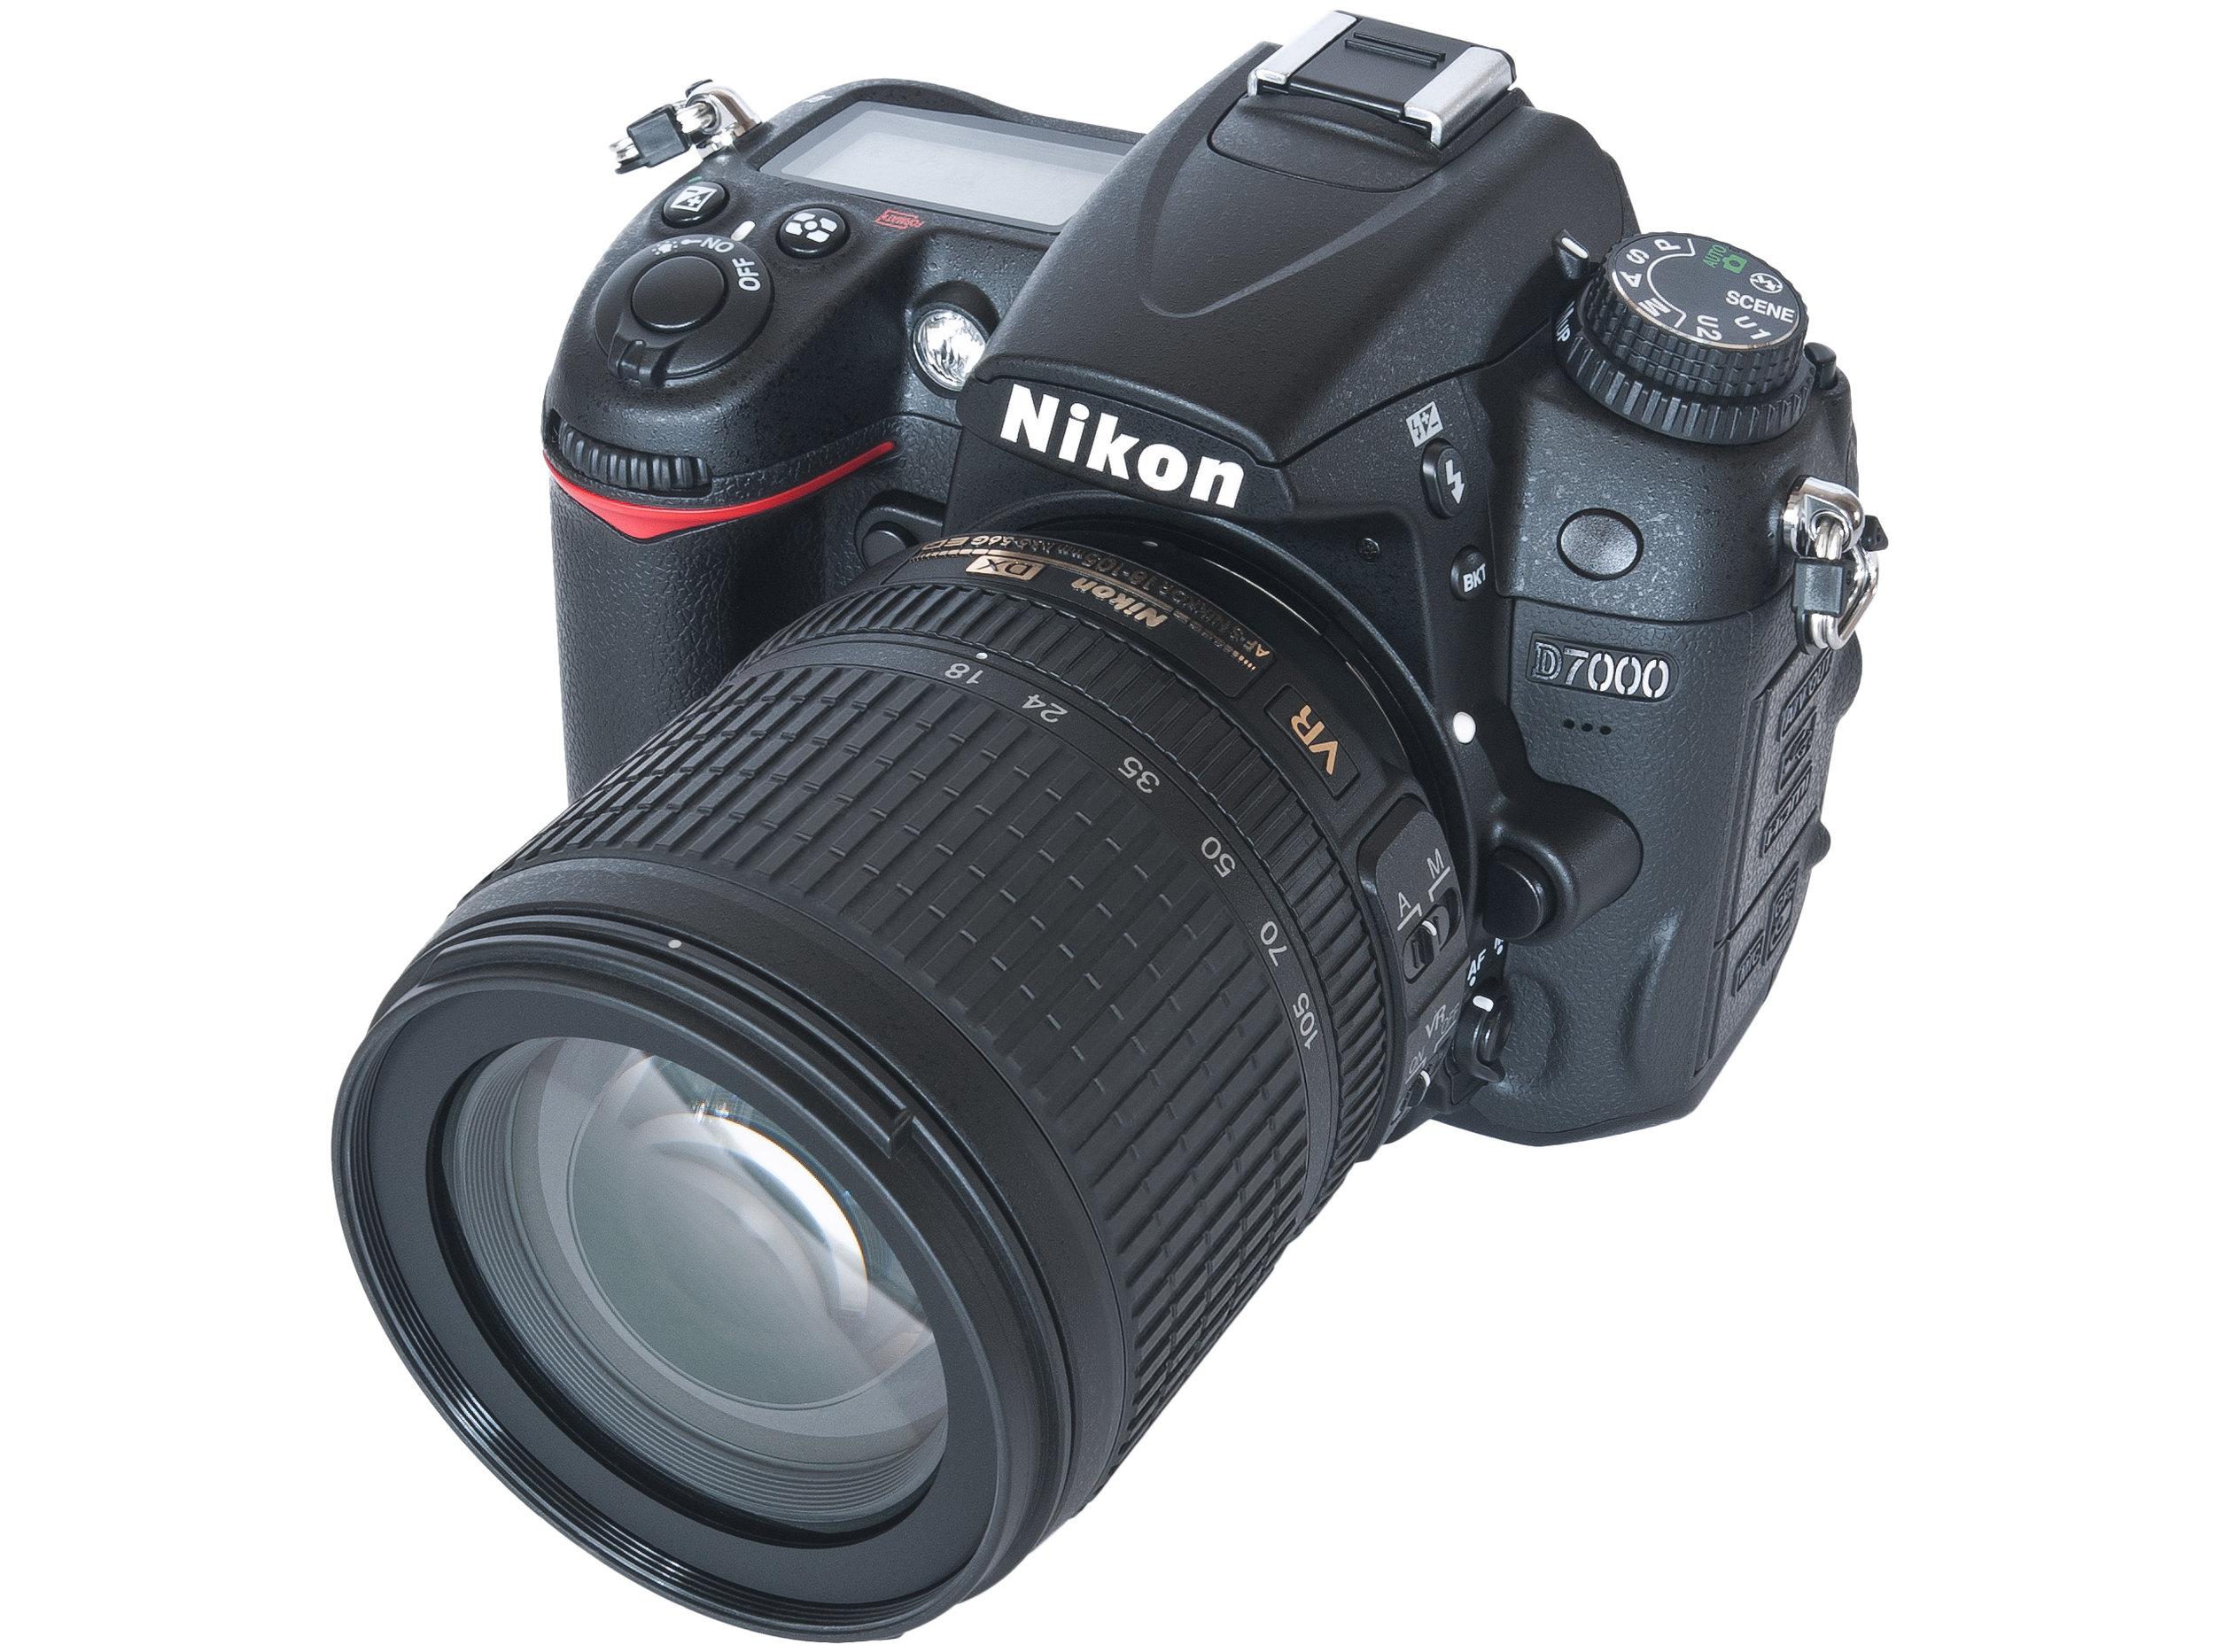 Nikon_D7000+18-105_Lens.jpg